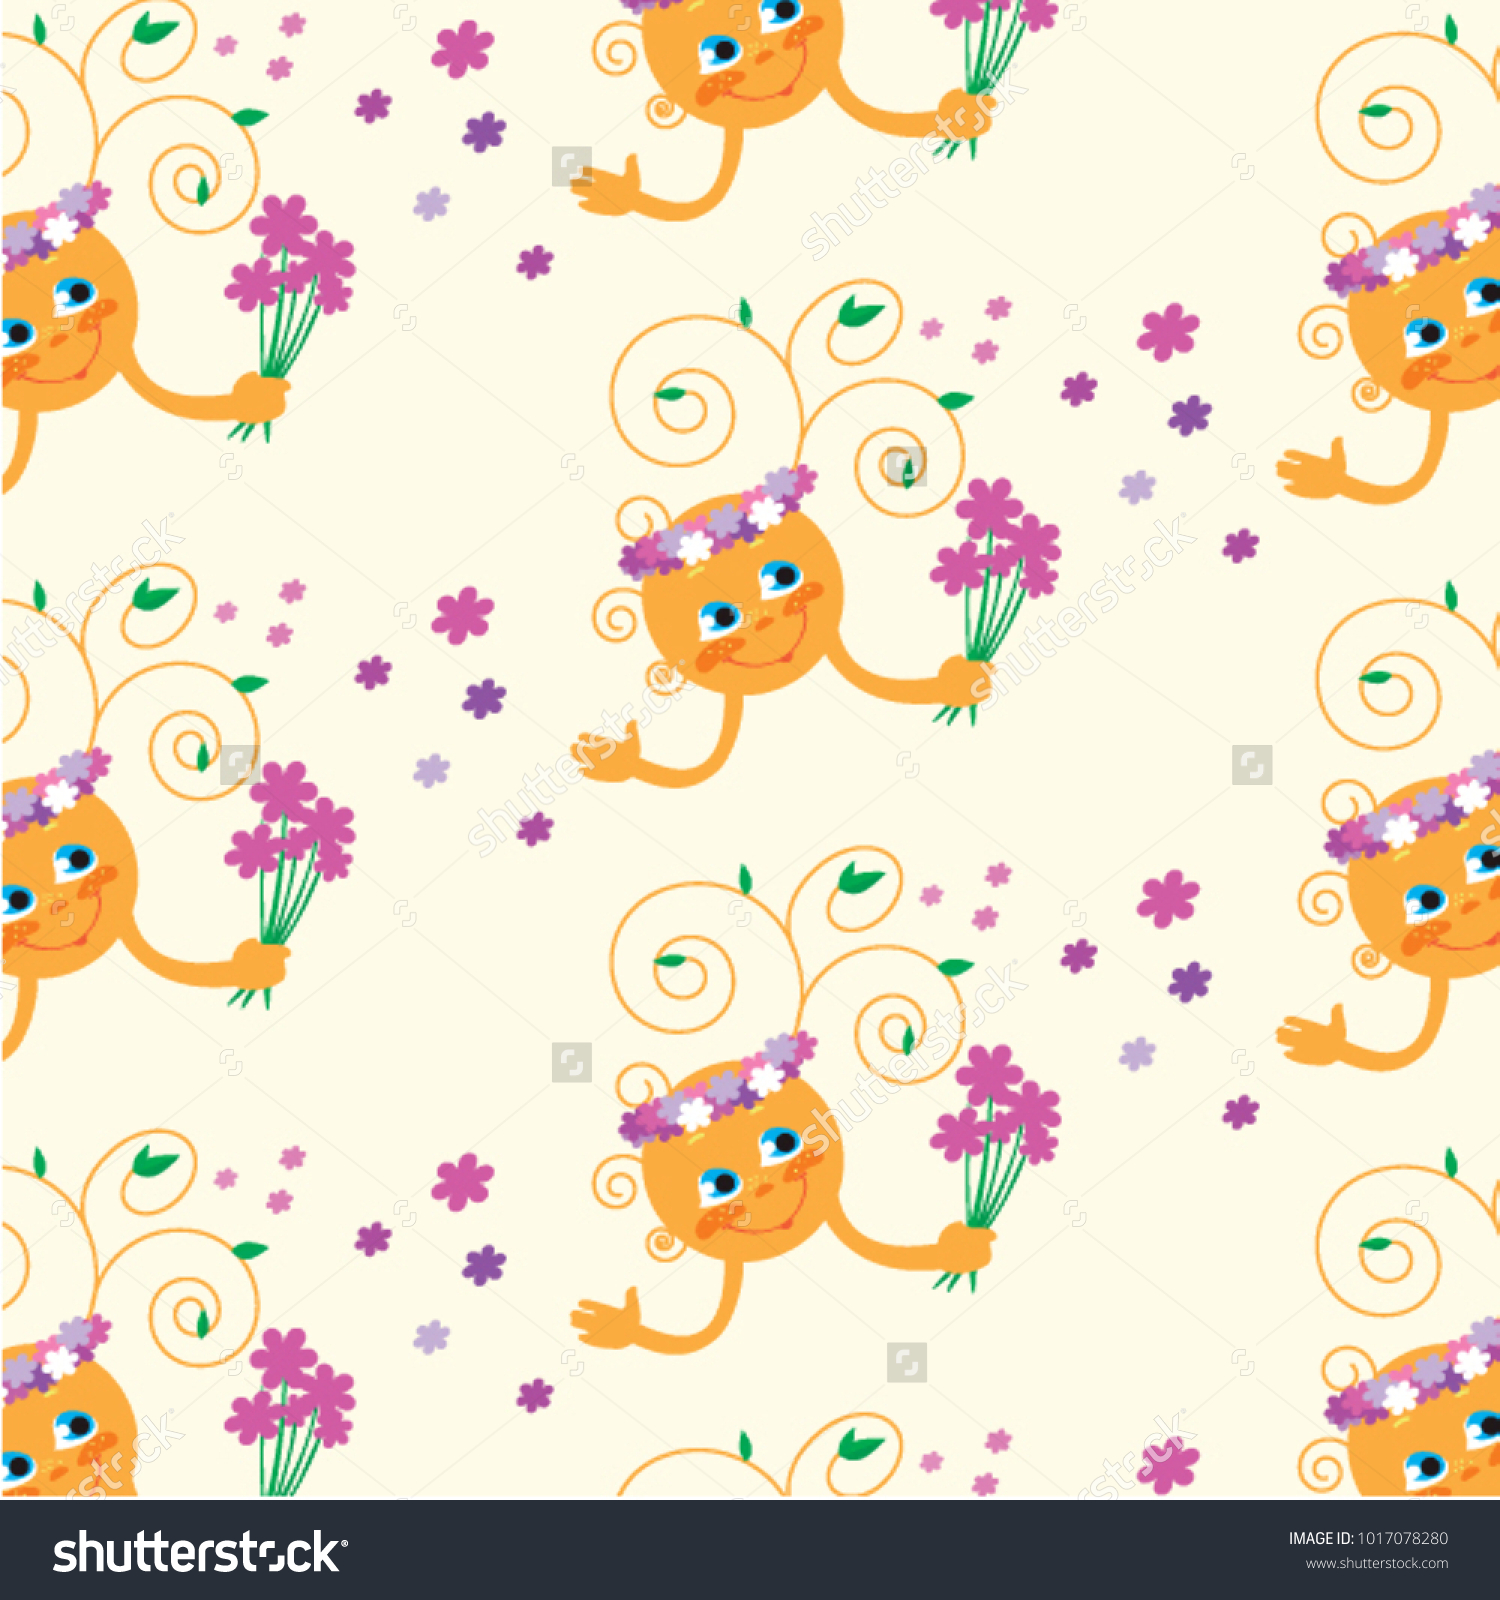 Animated sun bouquet flowers stock vector royalty free 1017078280 animated sun with a bouquet of flowers izmirmasajfo